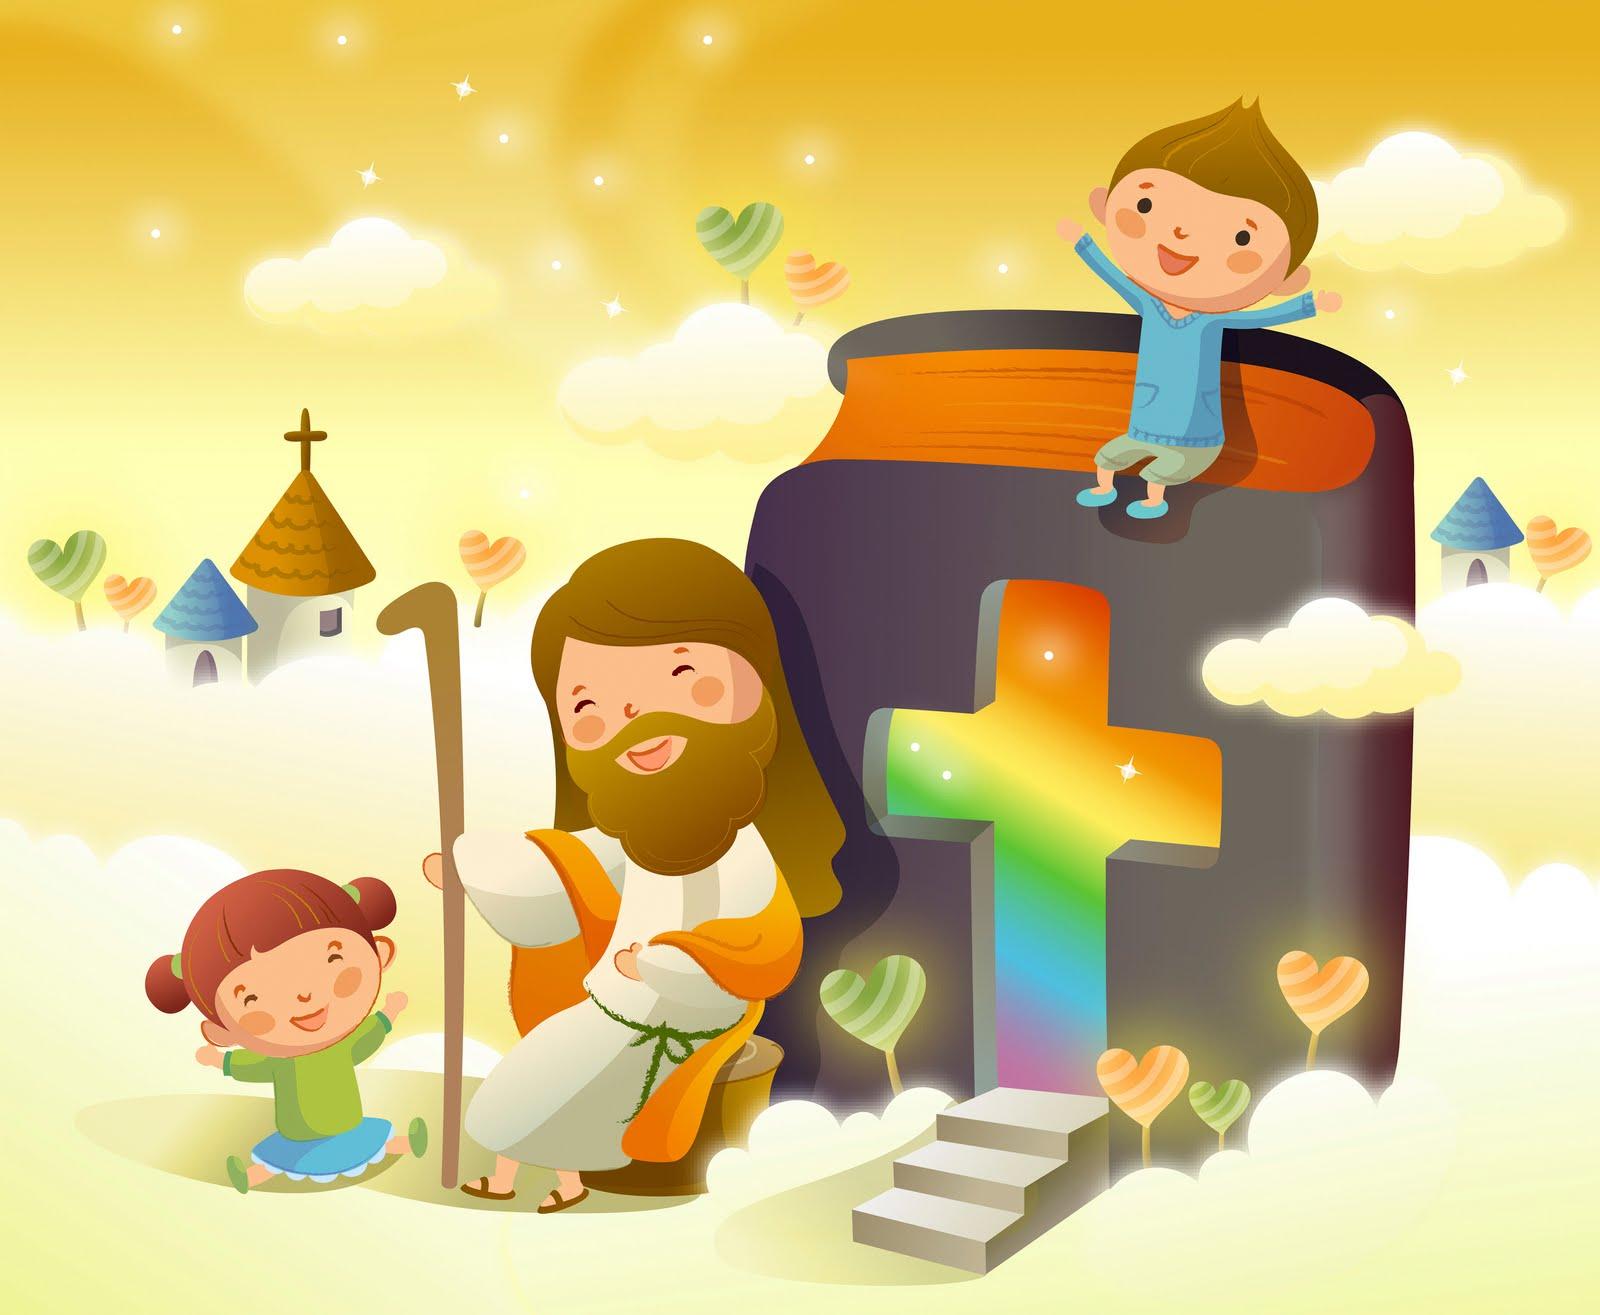 Junta diocesana de catequesis ober ilustraciones - Dibujos para la pared ...